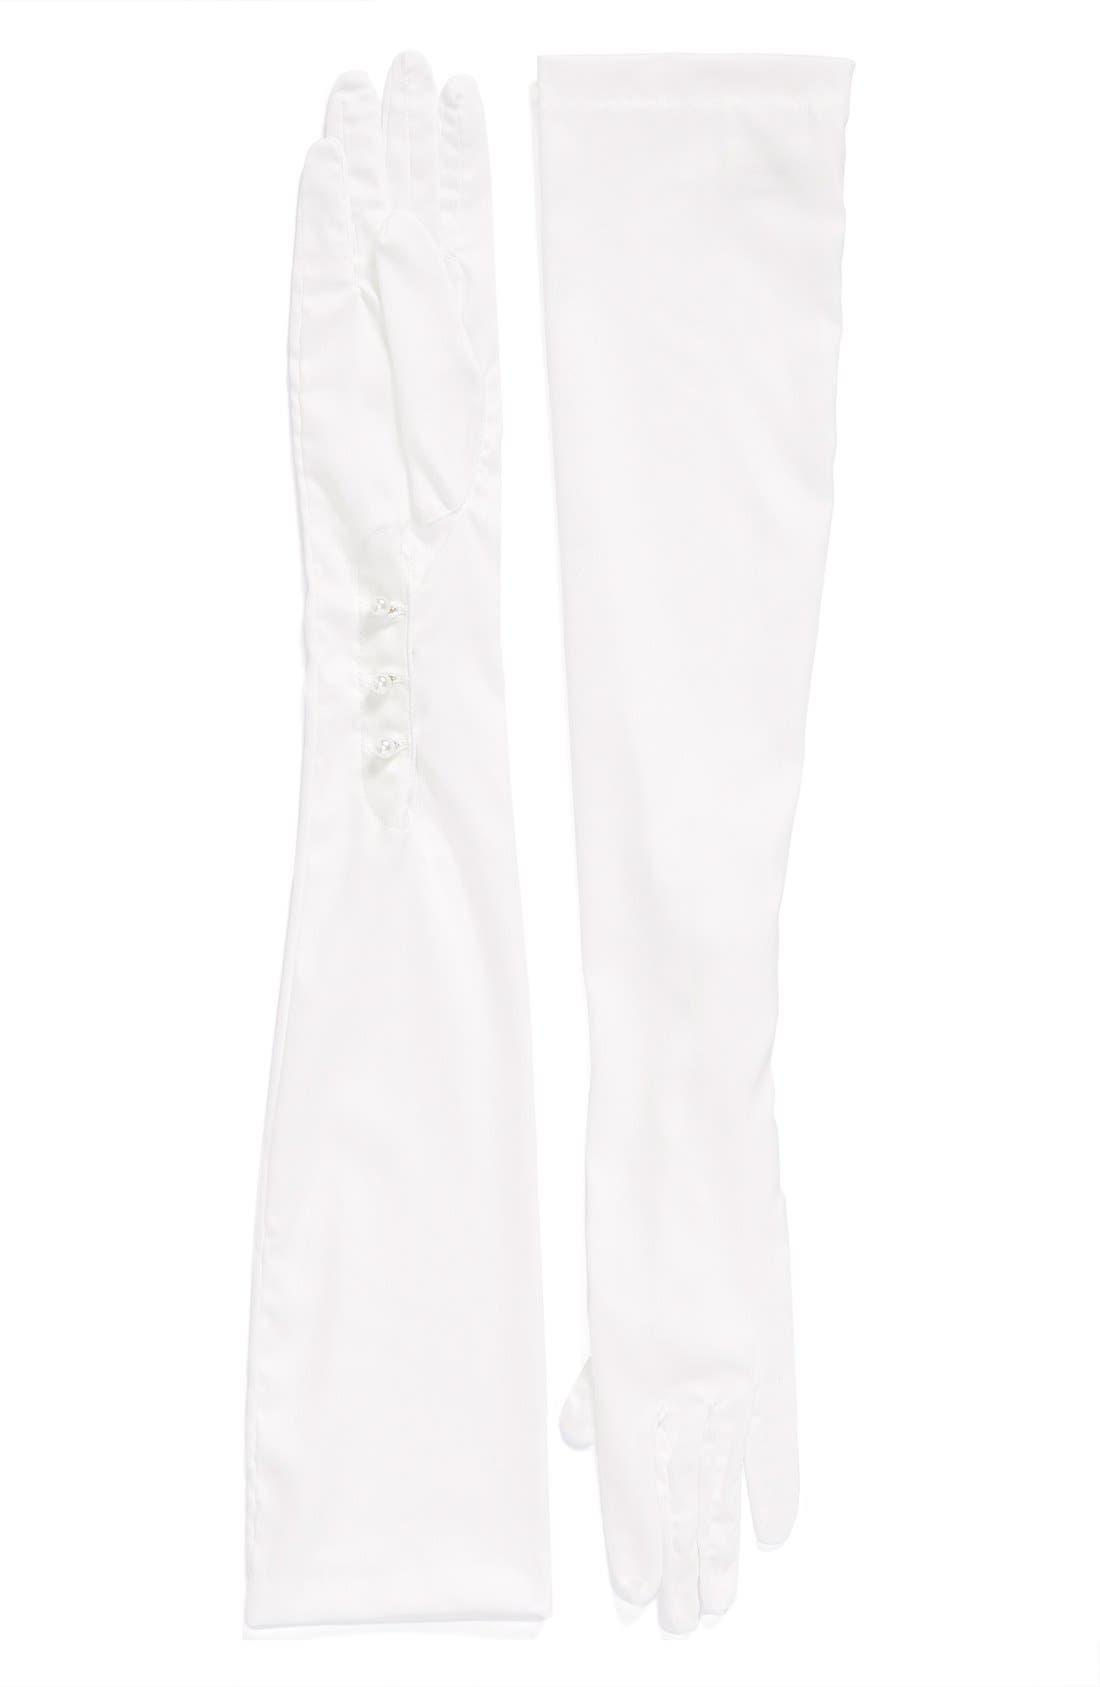 Debutante Opera Length Mousquetaire Gloves,                             Main thumbnail 1, color,                             Diamond White